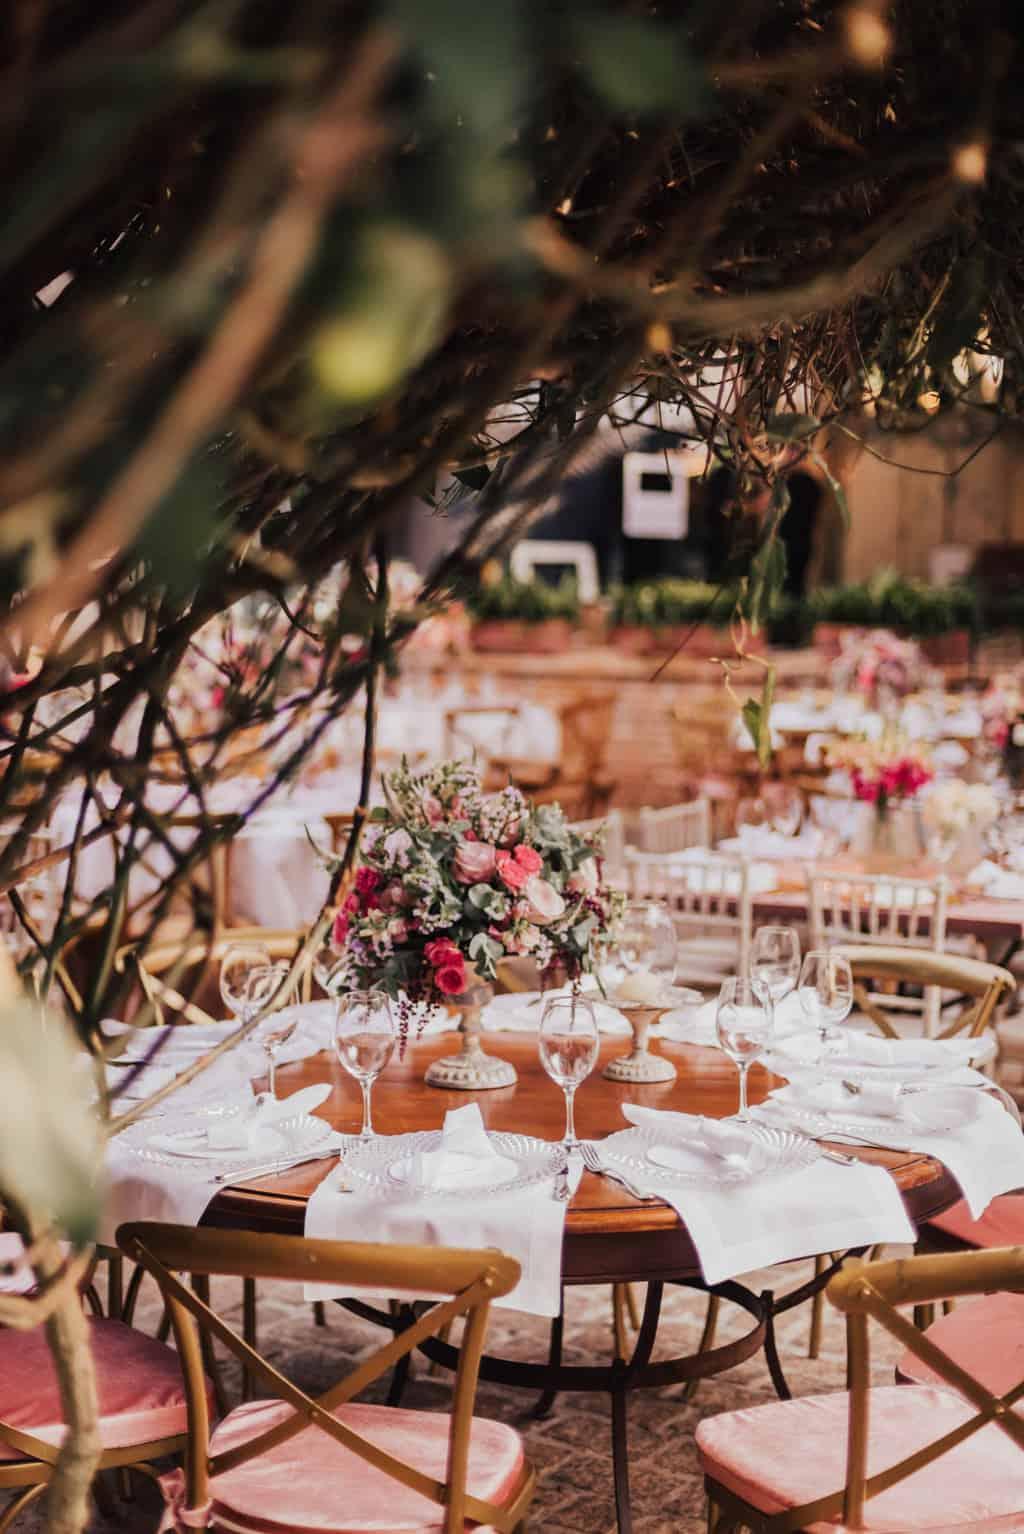 Boutique-de-Cena-casamento-Rebeca-e-Eldrey-Fazenda-Vila-Rica-Fotografia-Mana-Gollo-mesa-dos-convidados-Toda-de-Branco28